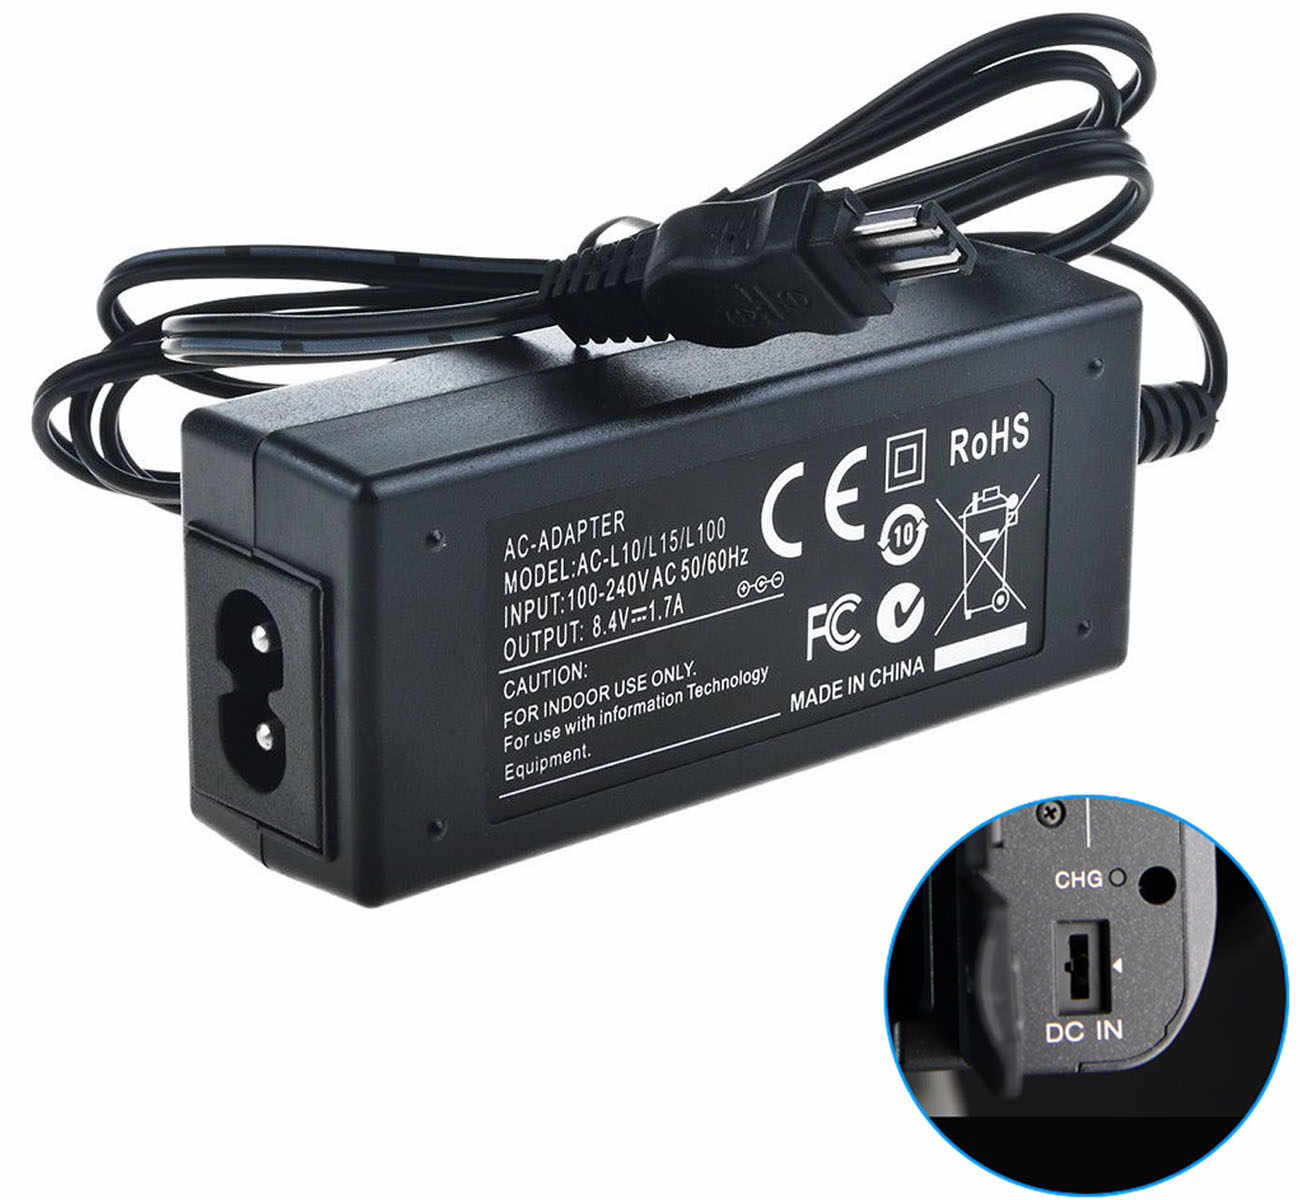 MVC-CD400 Digital Camera plus HQRP Coaster MVC-CD200 MVC-CD300 MVC-CD350 MVC-CD250 HQRP Replacement AC Adapter//Charger for Sony Mavica MVC-CD1000